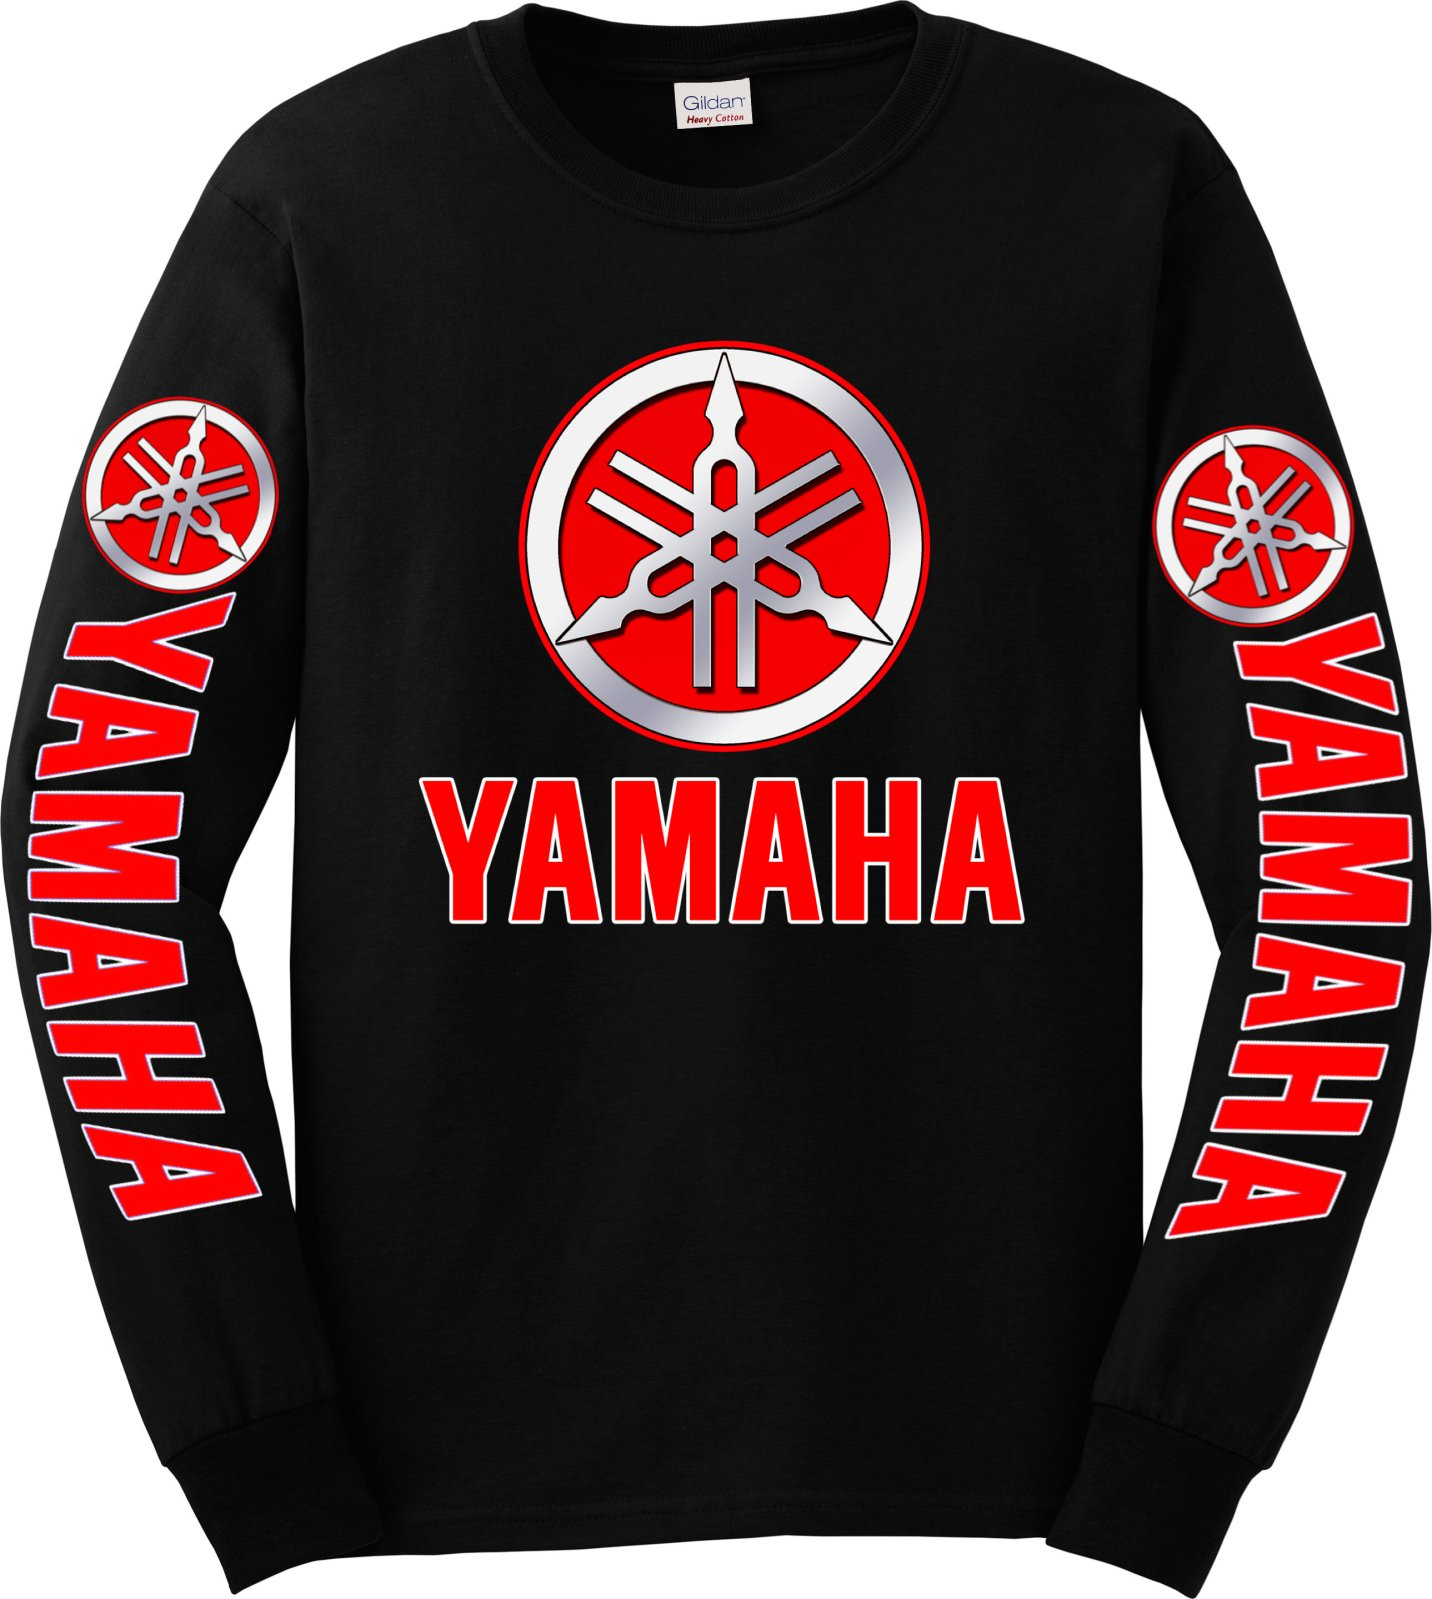 Yamaha Red Logo Long Sleeve T-Shirt, 4XL Black